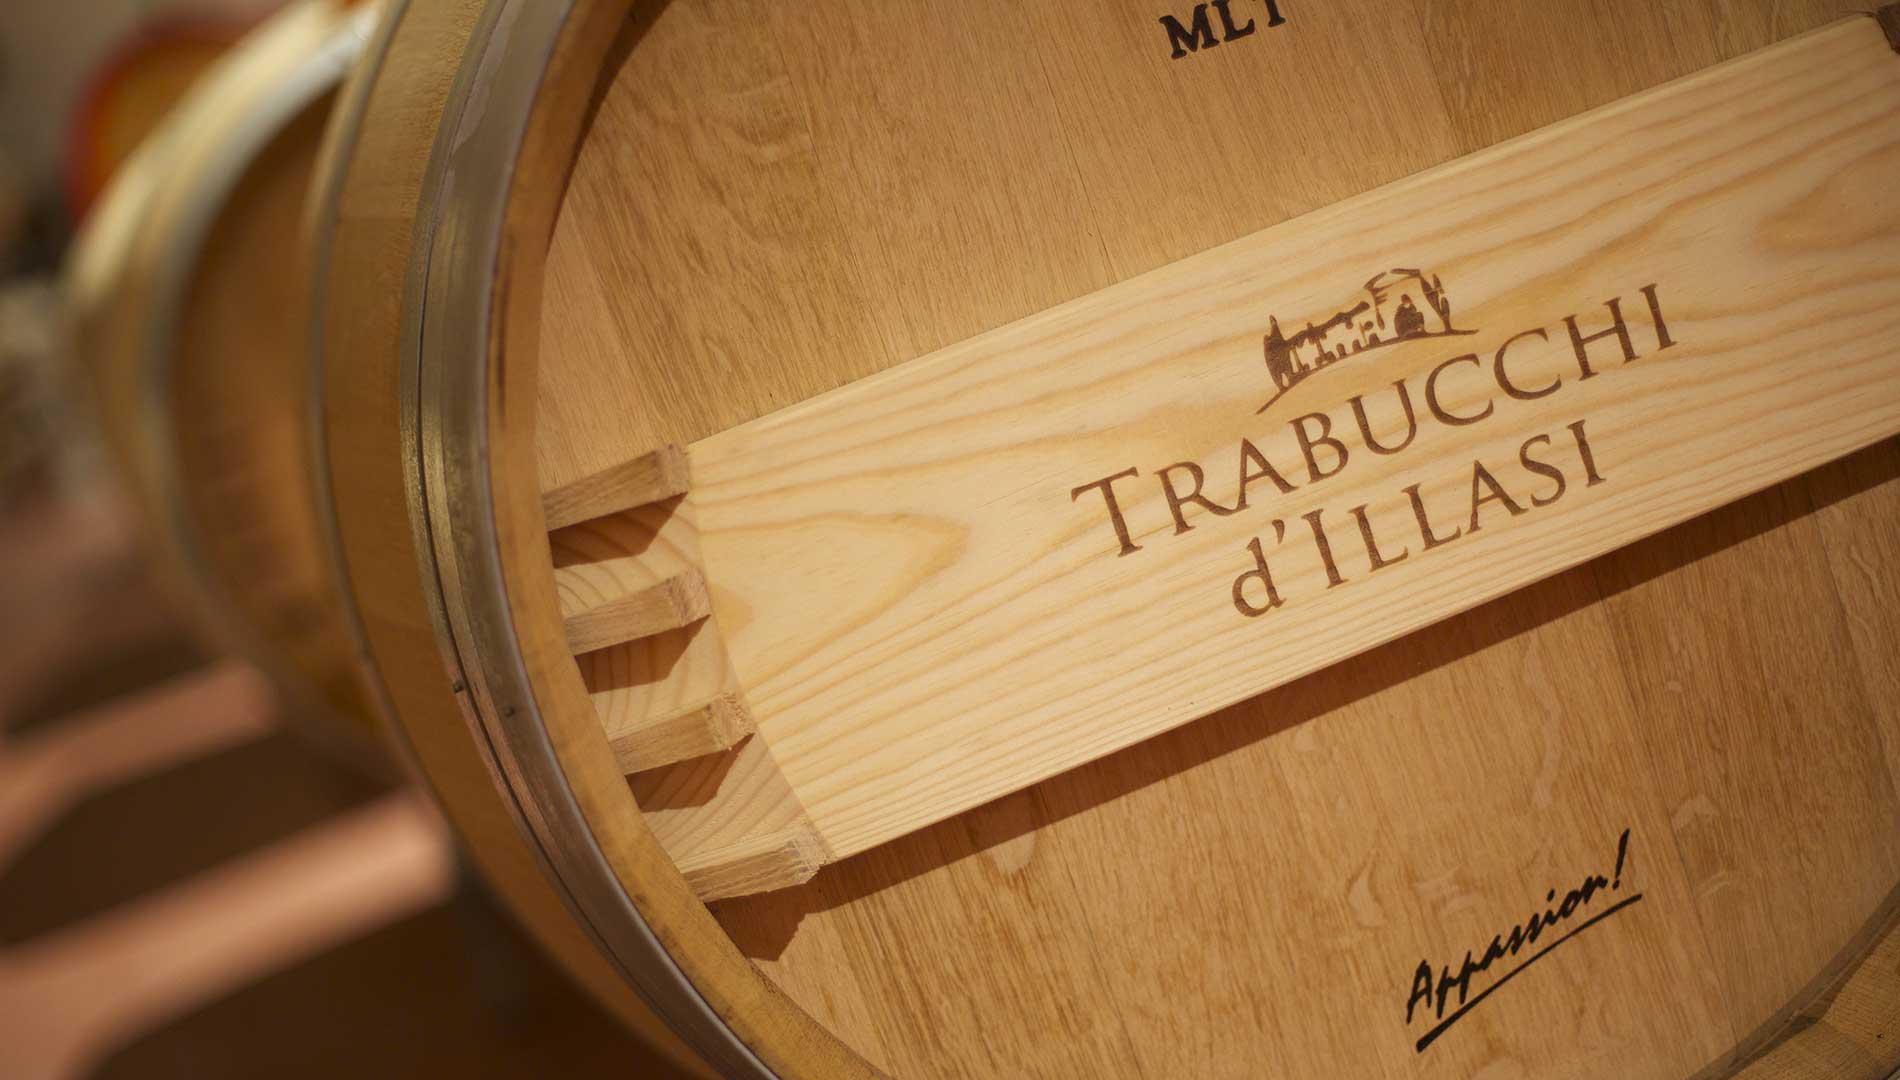 https://www.trabucchidillasi.it/wp-content/uploads/2018/01/Trabucchi-Illasi-degustazione-visita.jpg